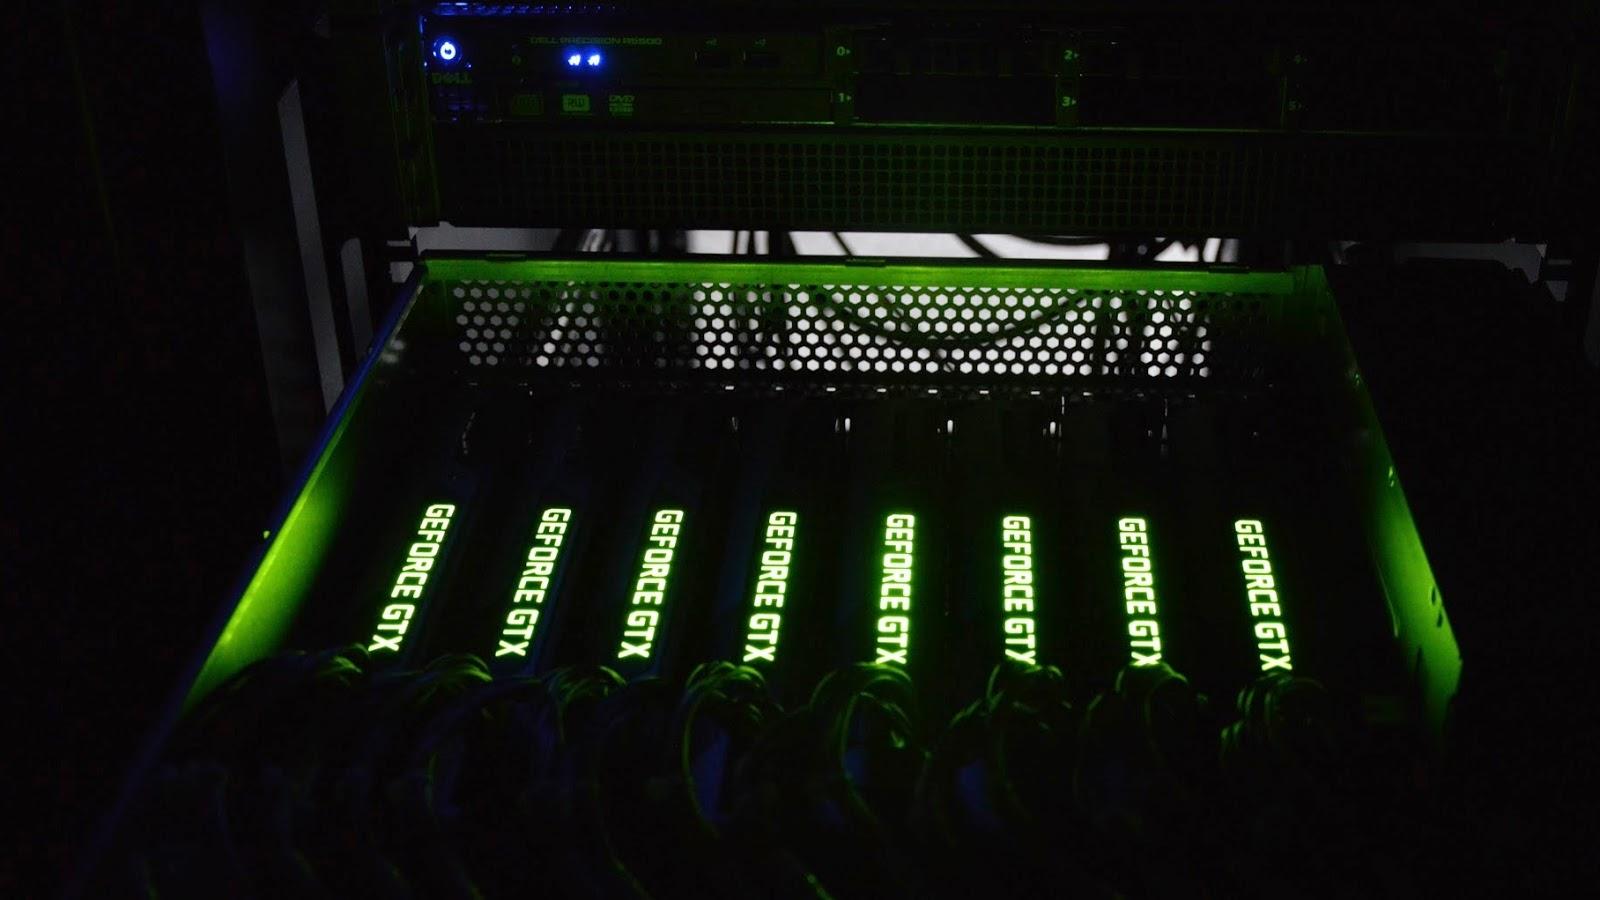 GPU server with GTX 1080Ti